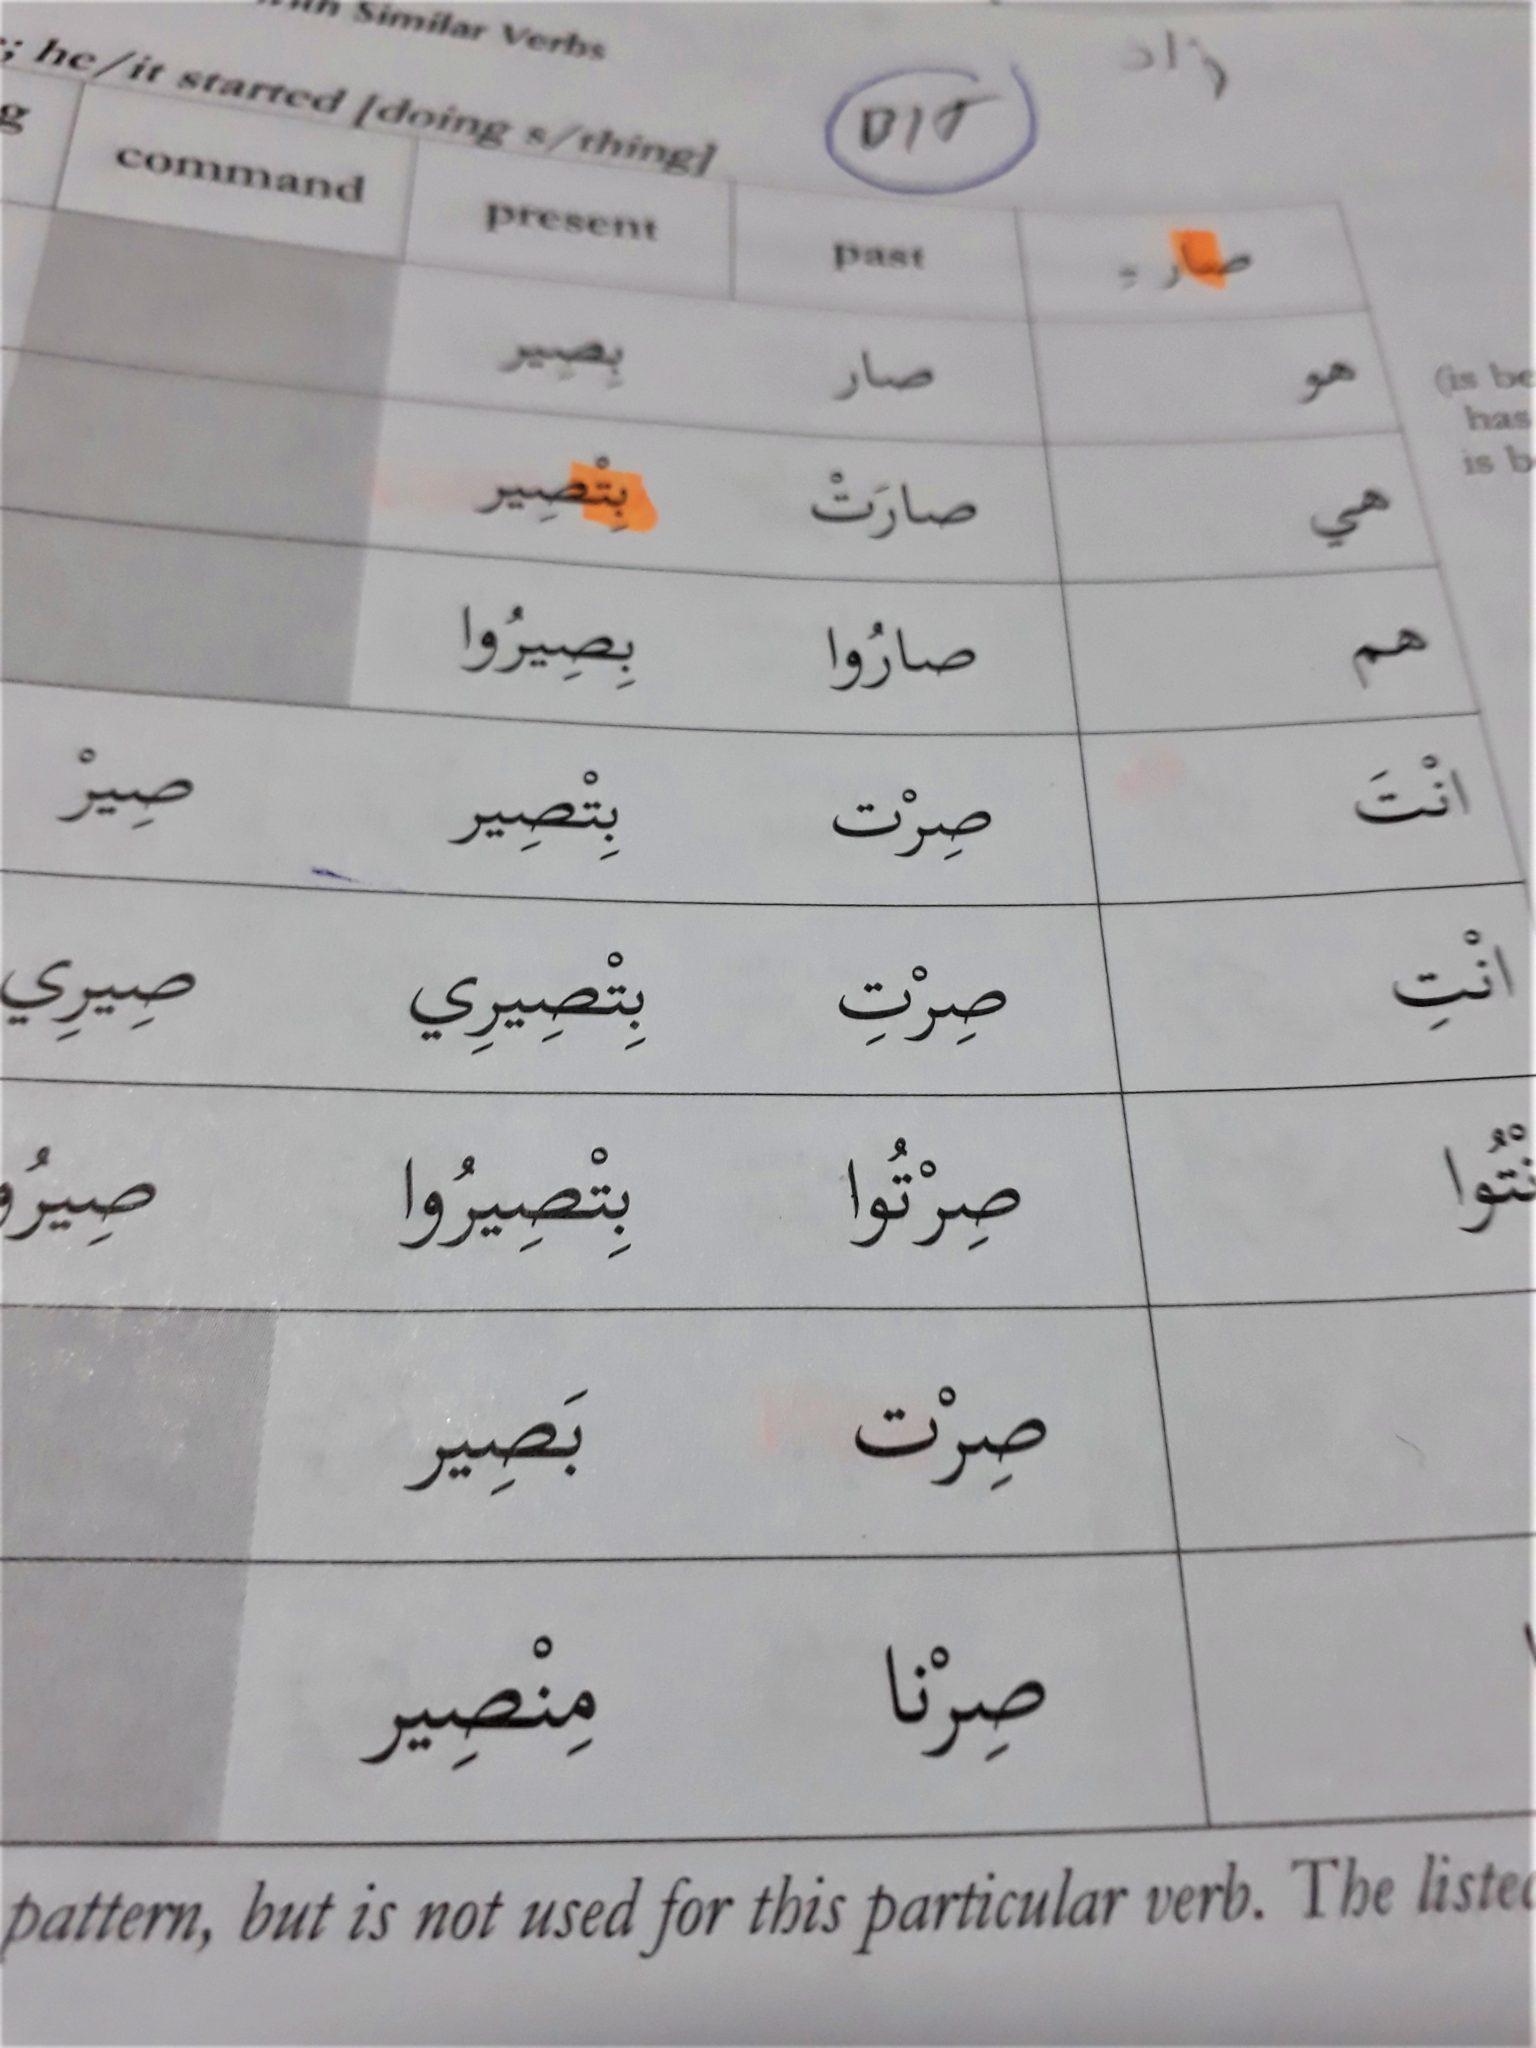 2 Pronunciation Tips To Conquer Verb Conjugations